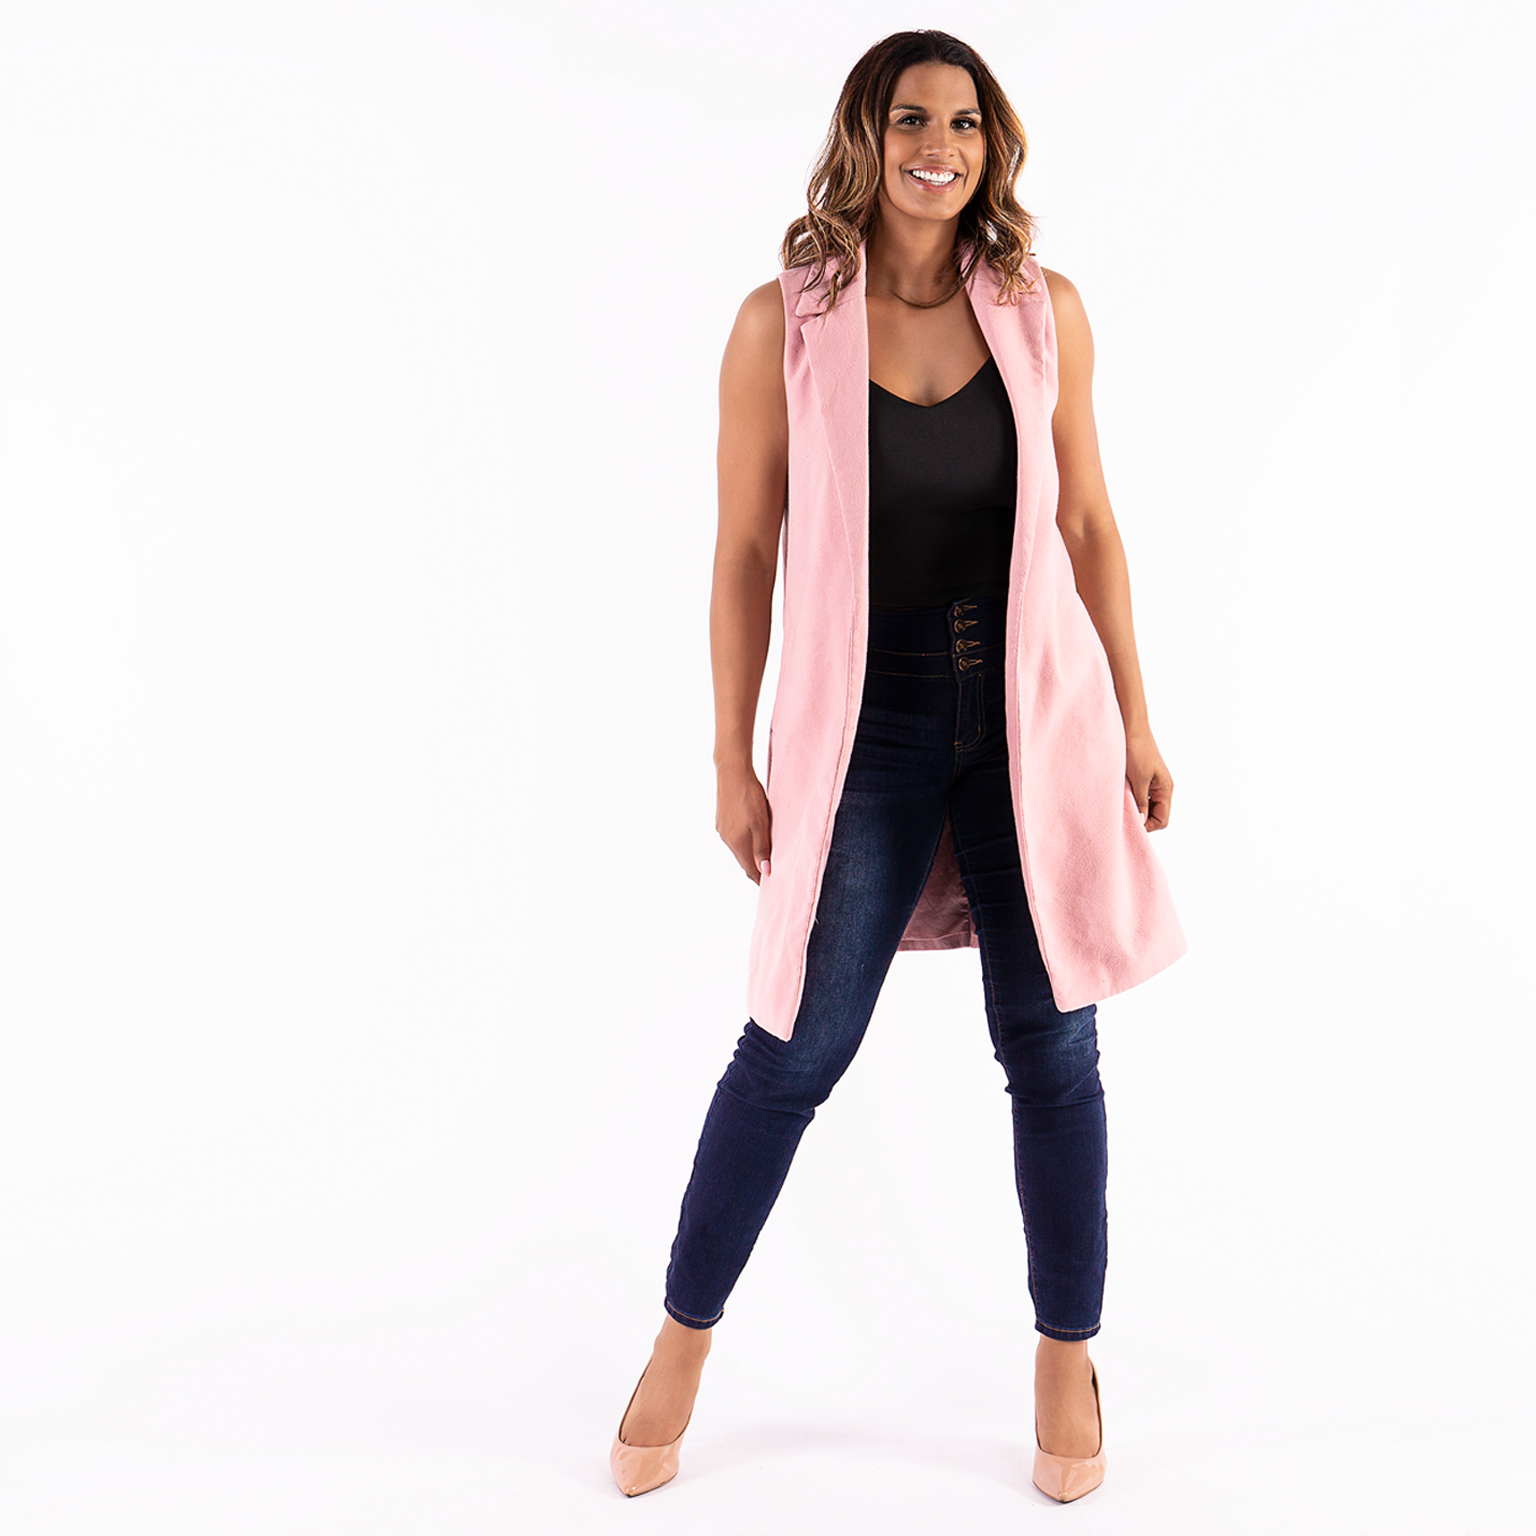 Toronto-Fitness-Model-Agency-Commercial-Lifestyle-Valerie-Saunders